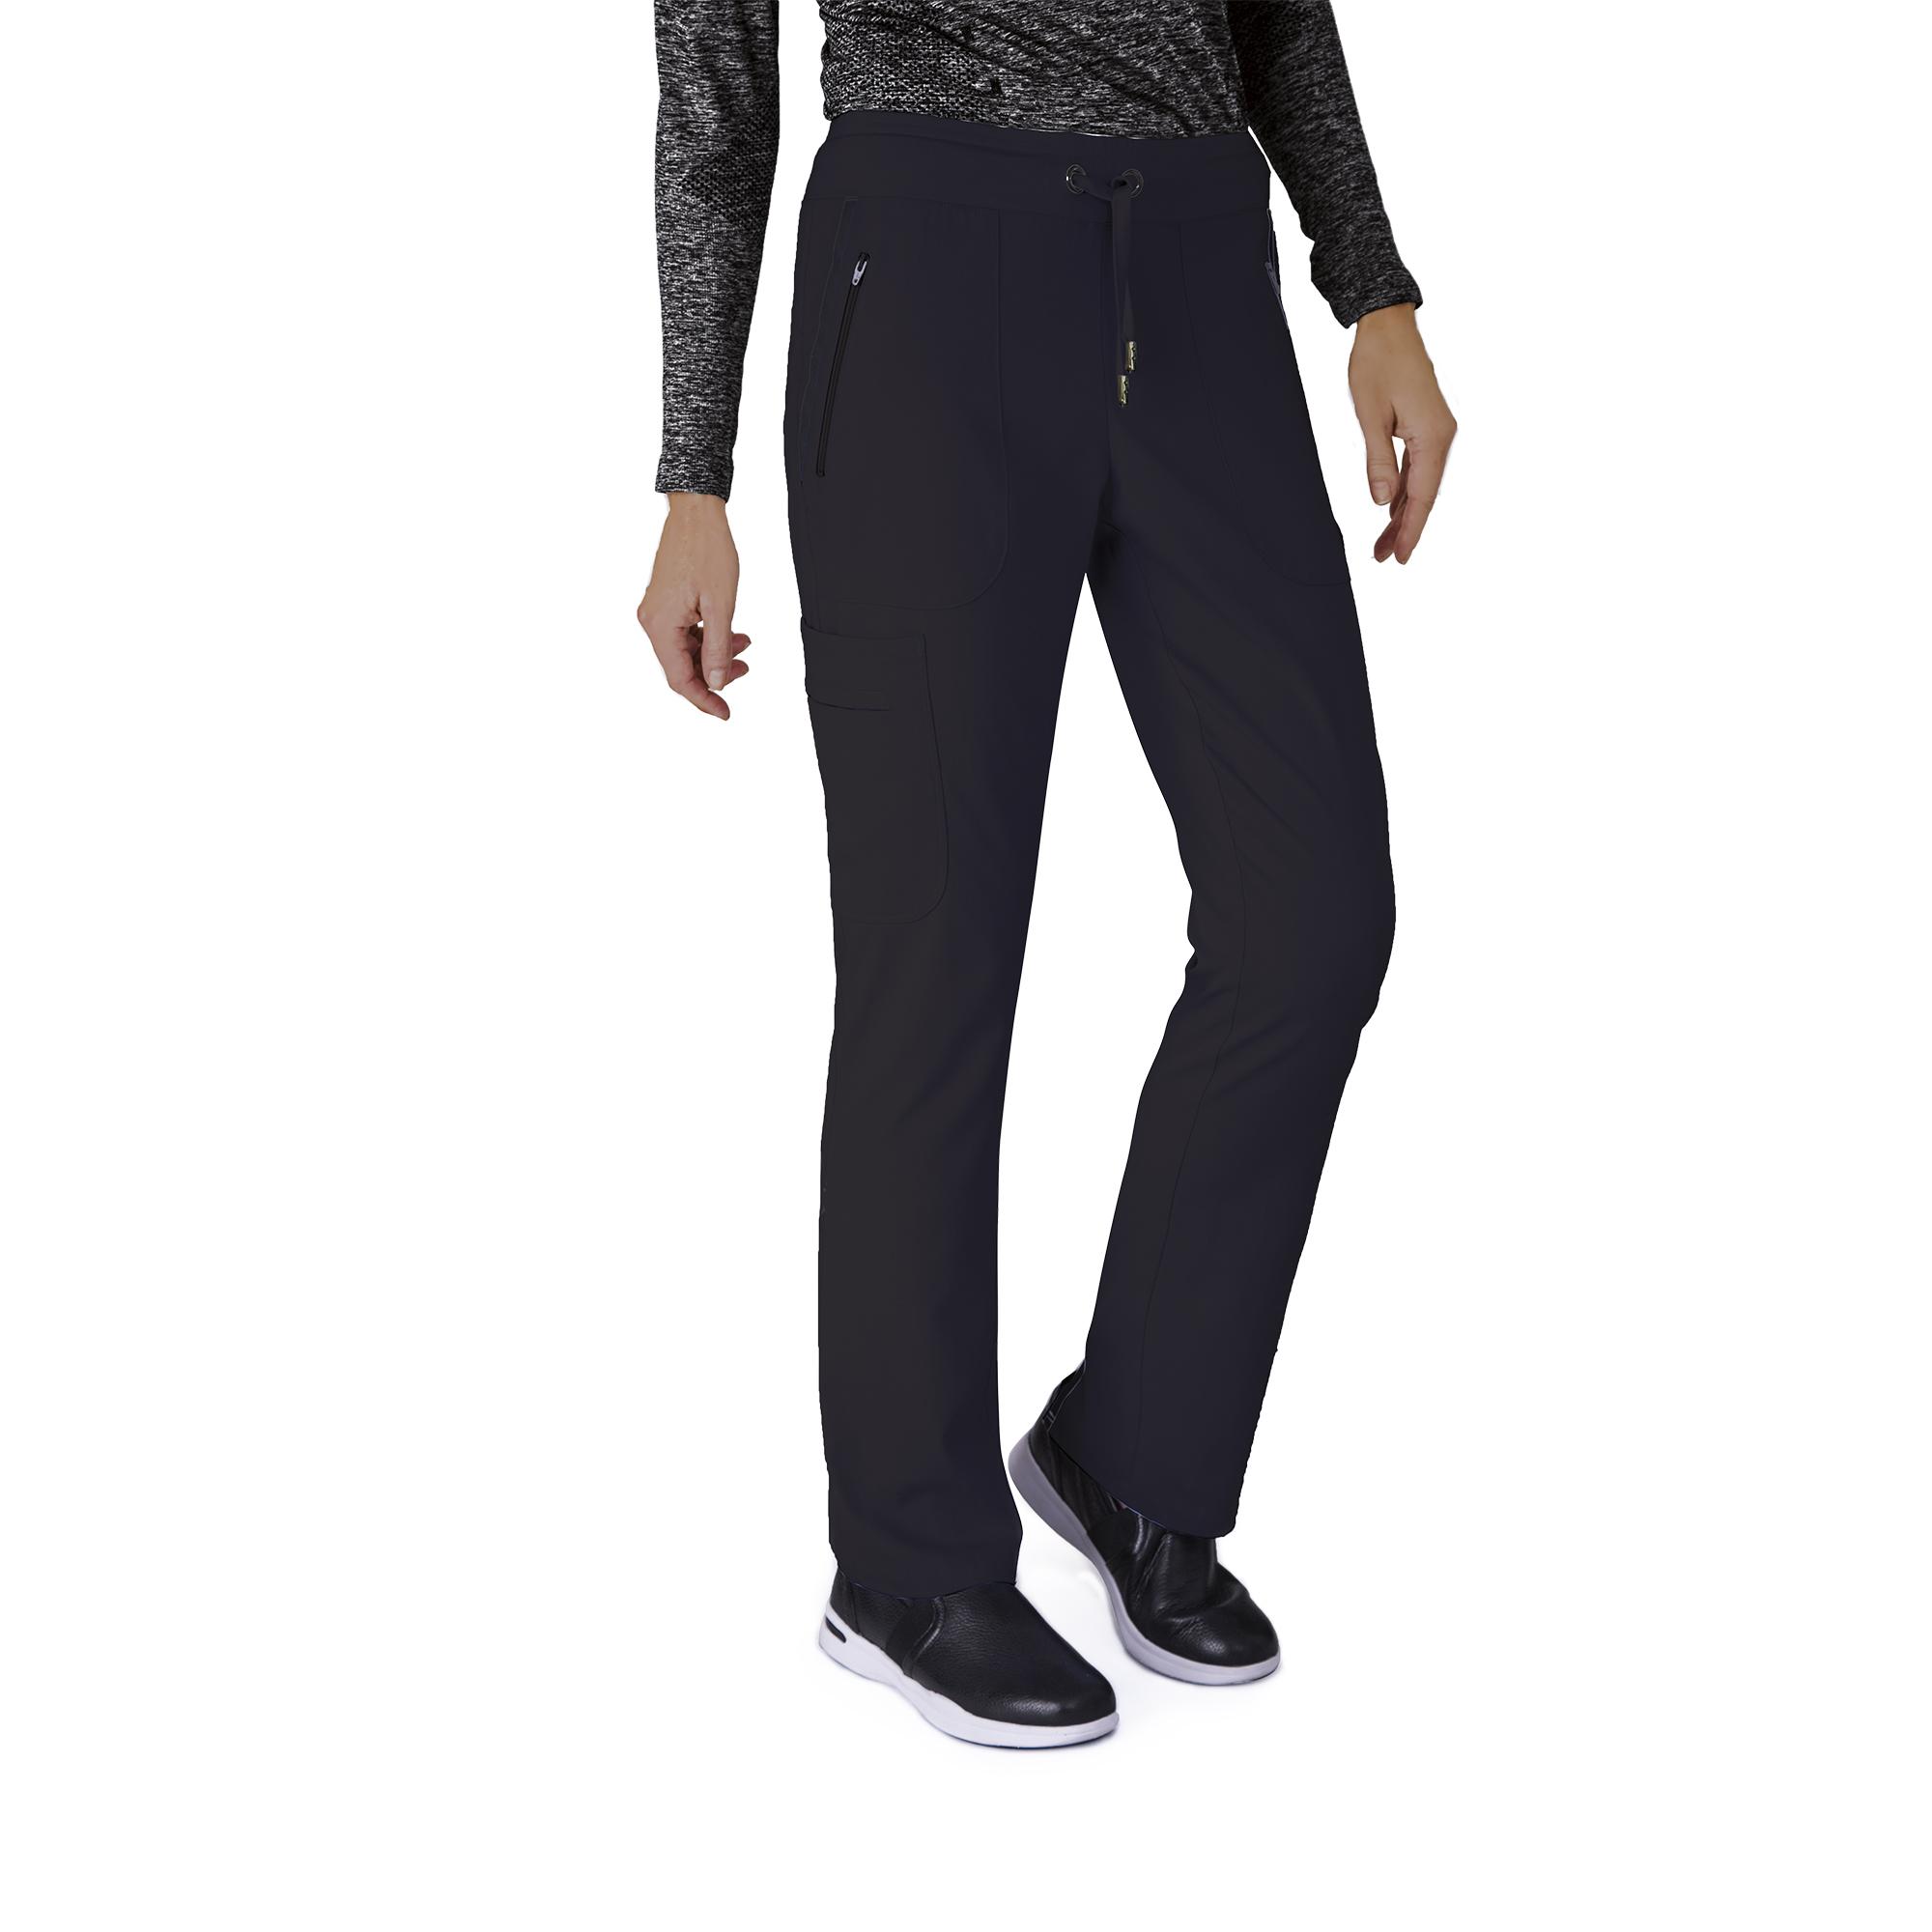 Barco Impact 6 Pocket Tape Knit Waist Pant-Greys Anatomy Impact